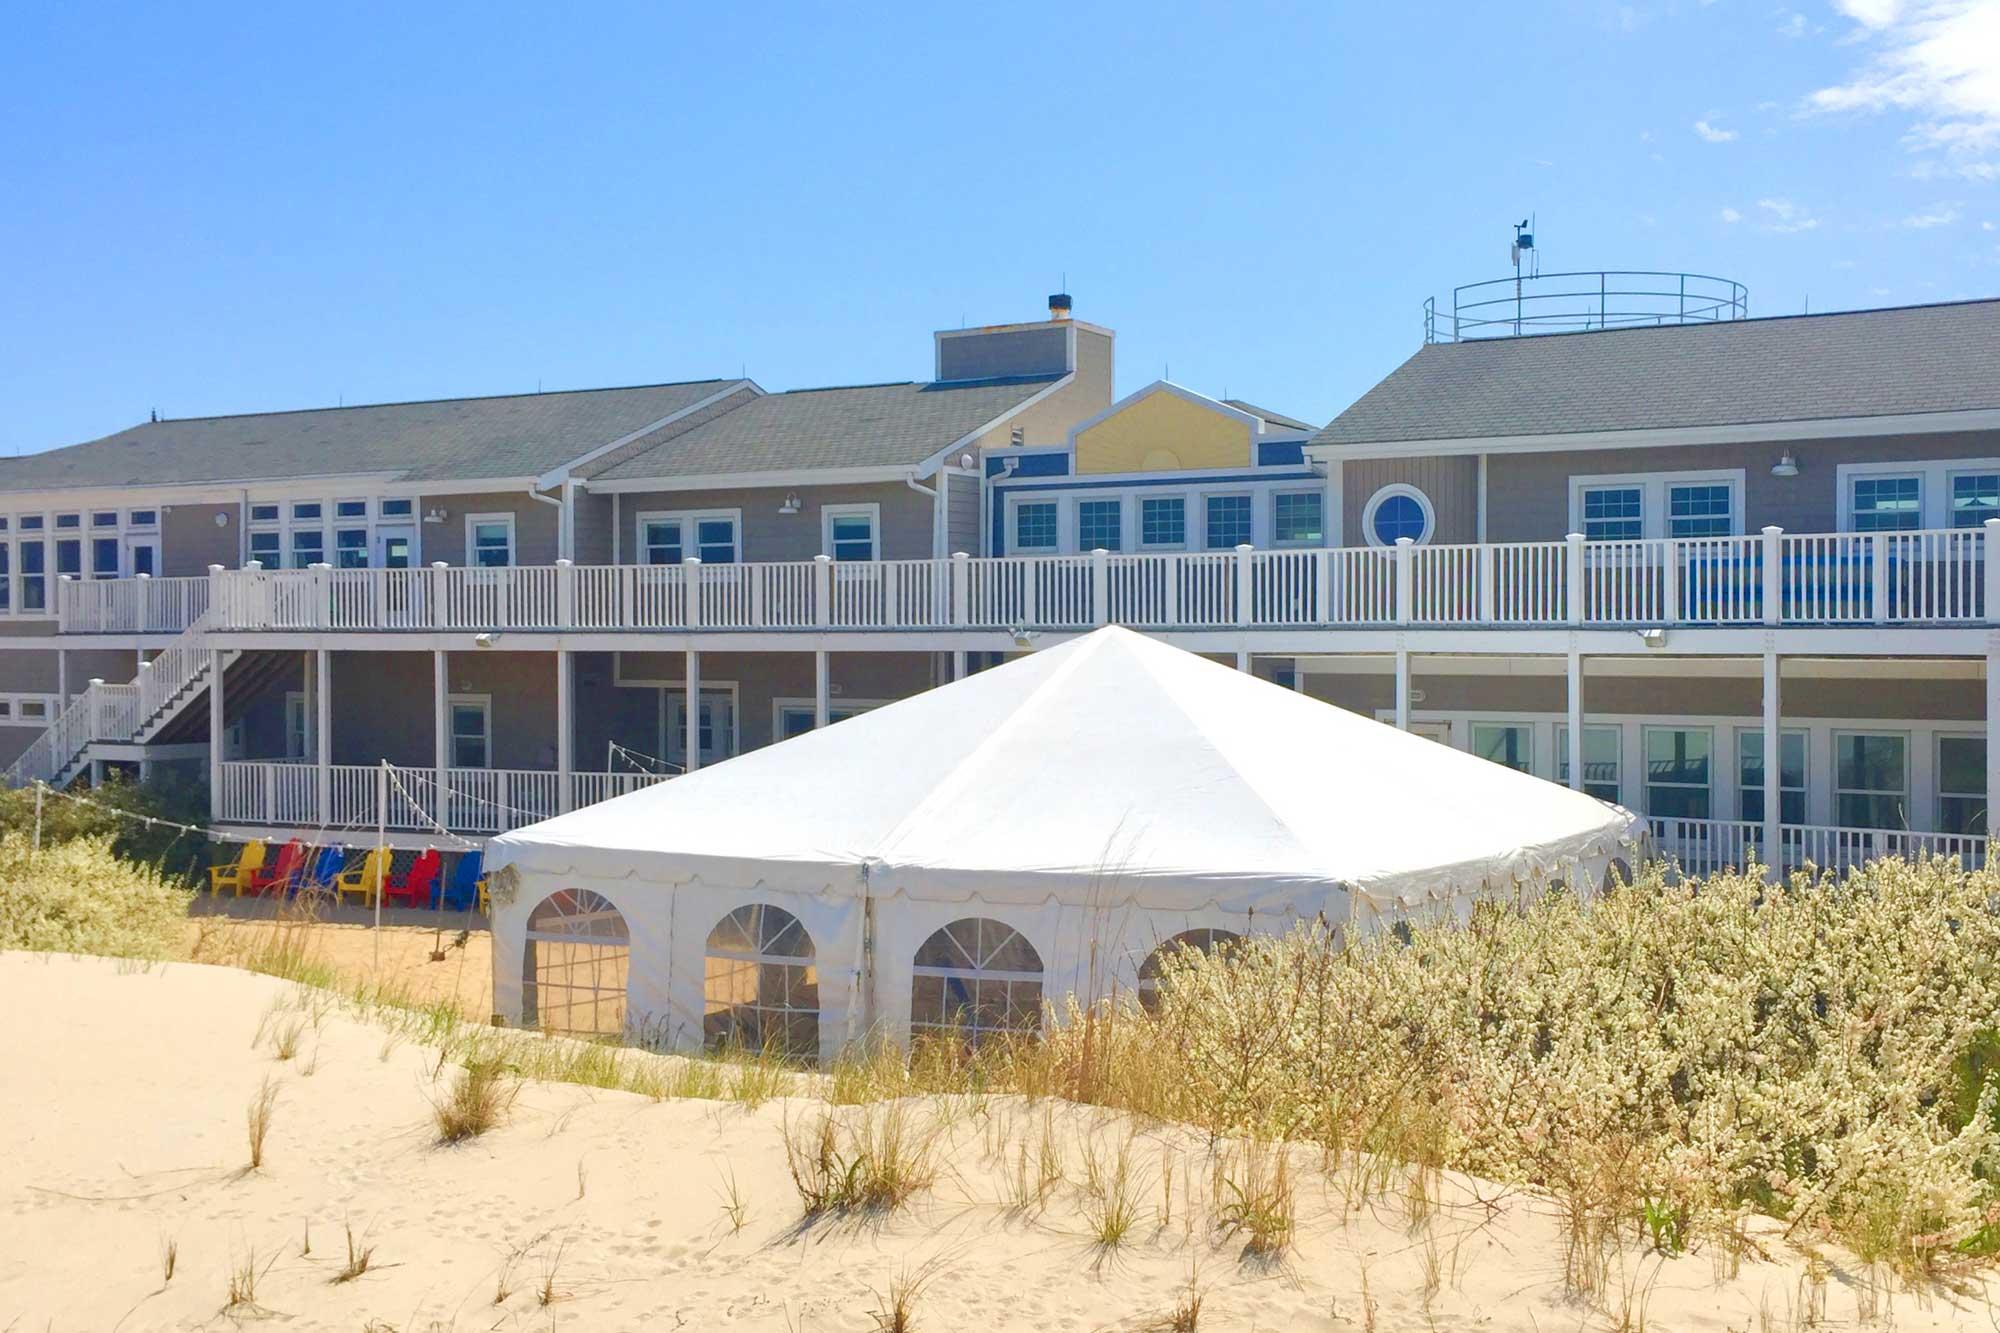 Beach wedding venue with tent.